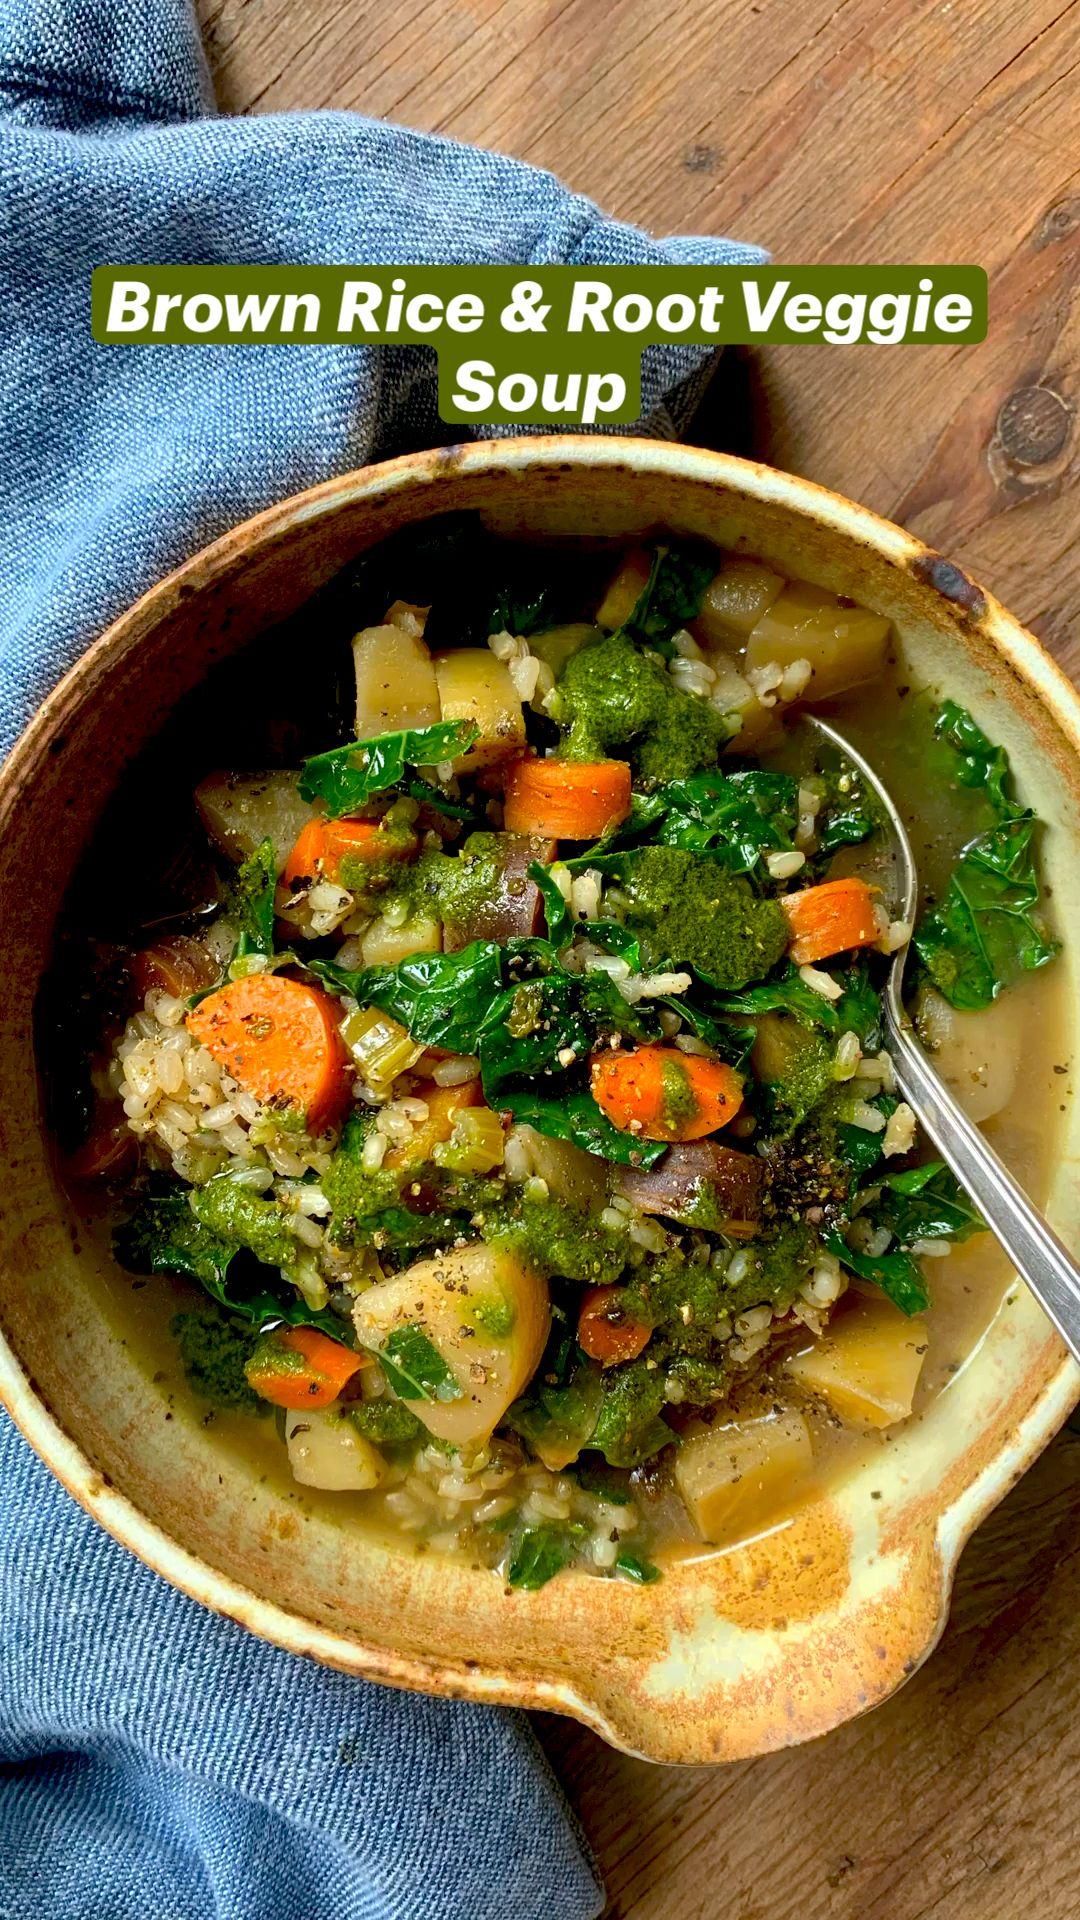 Brown Rice & Root Veggie Soup